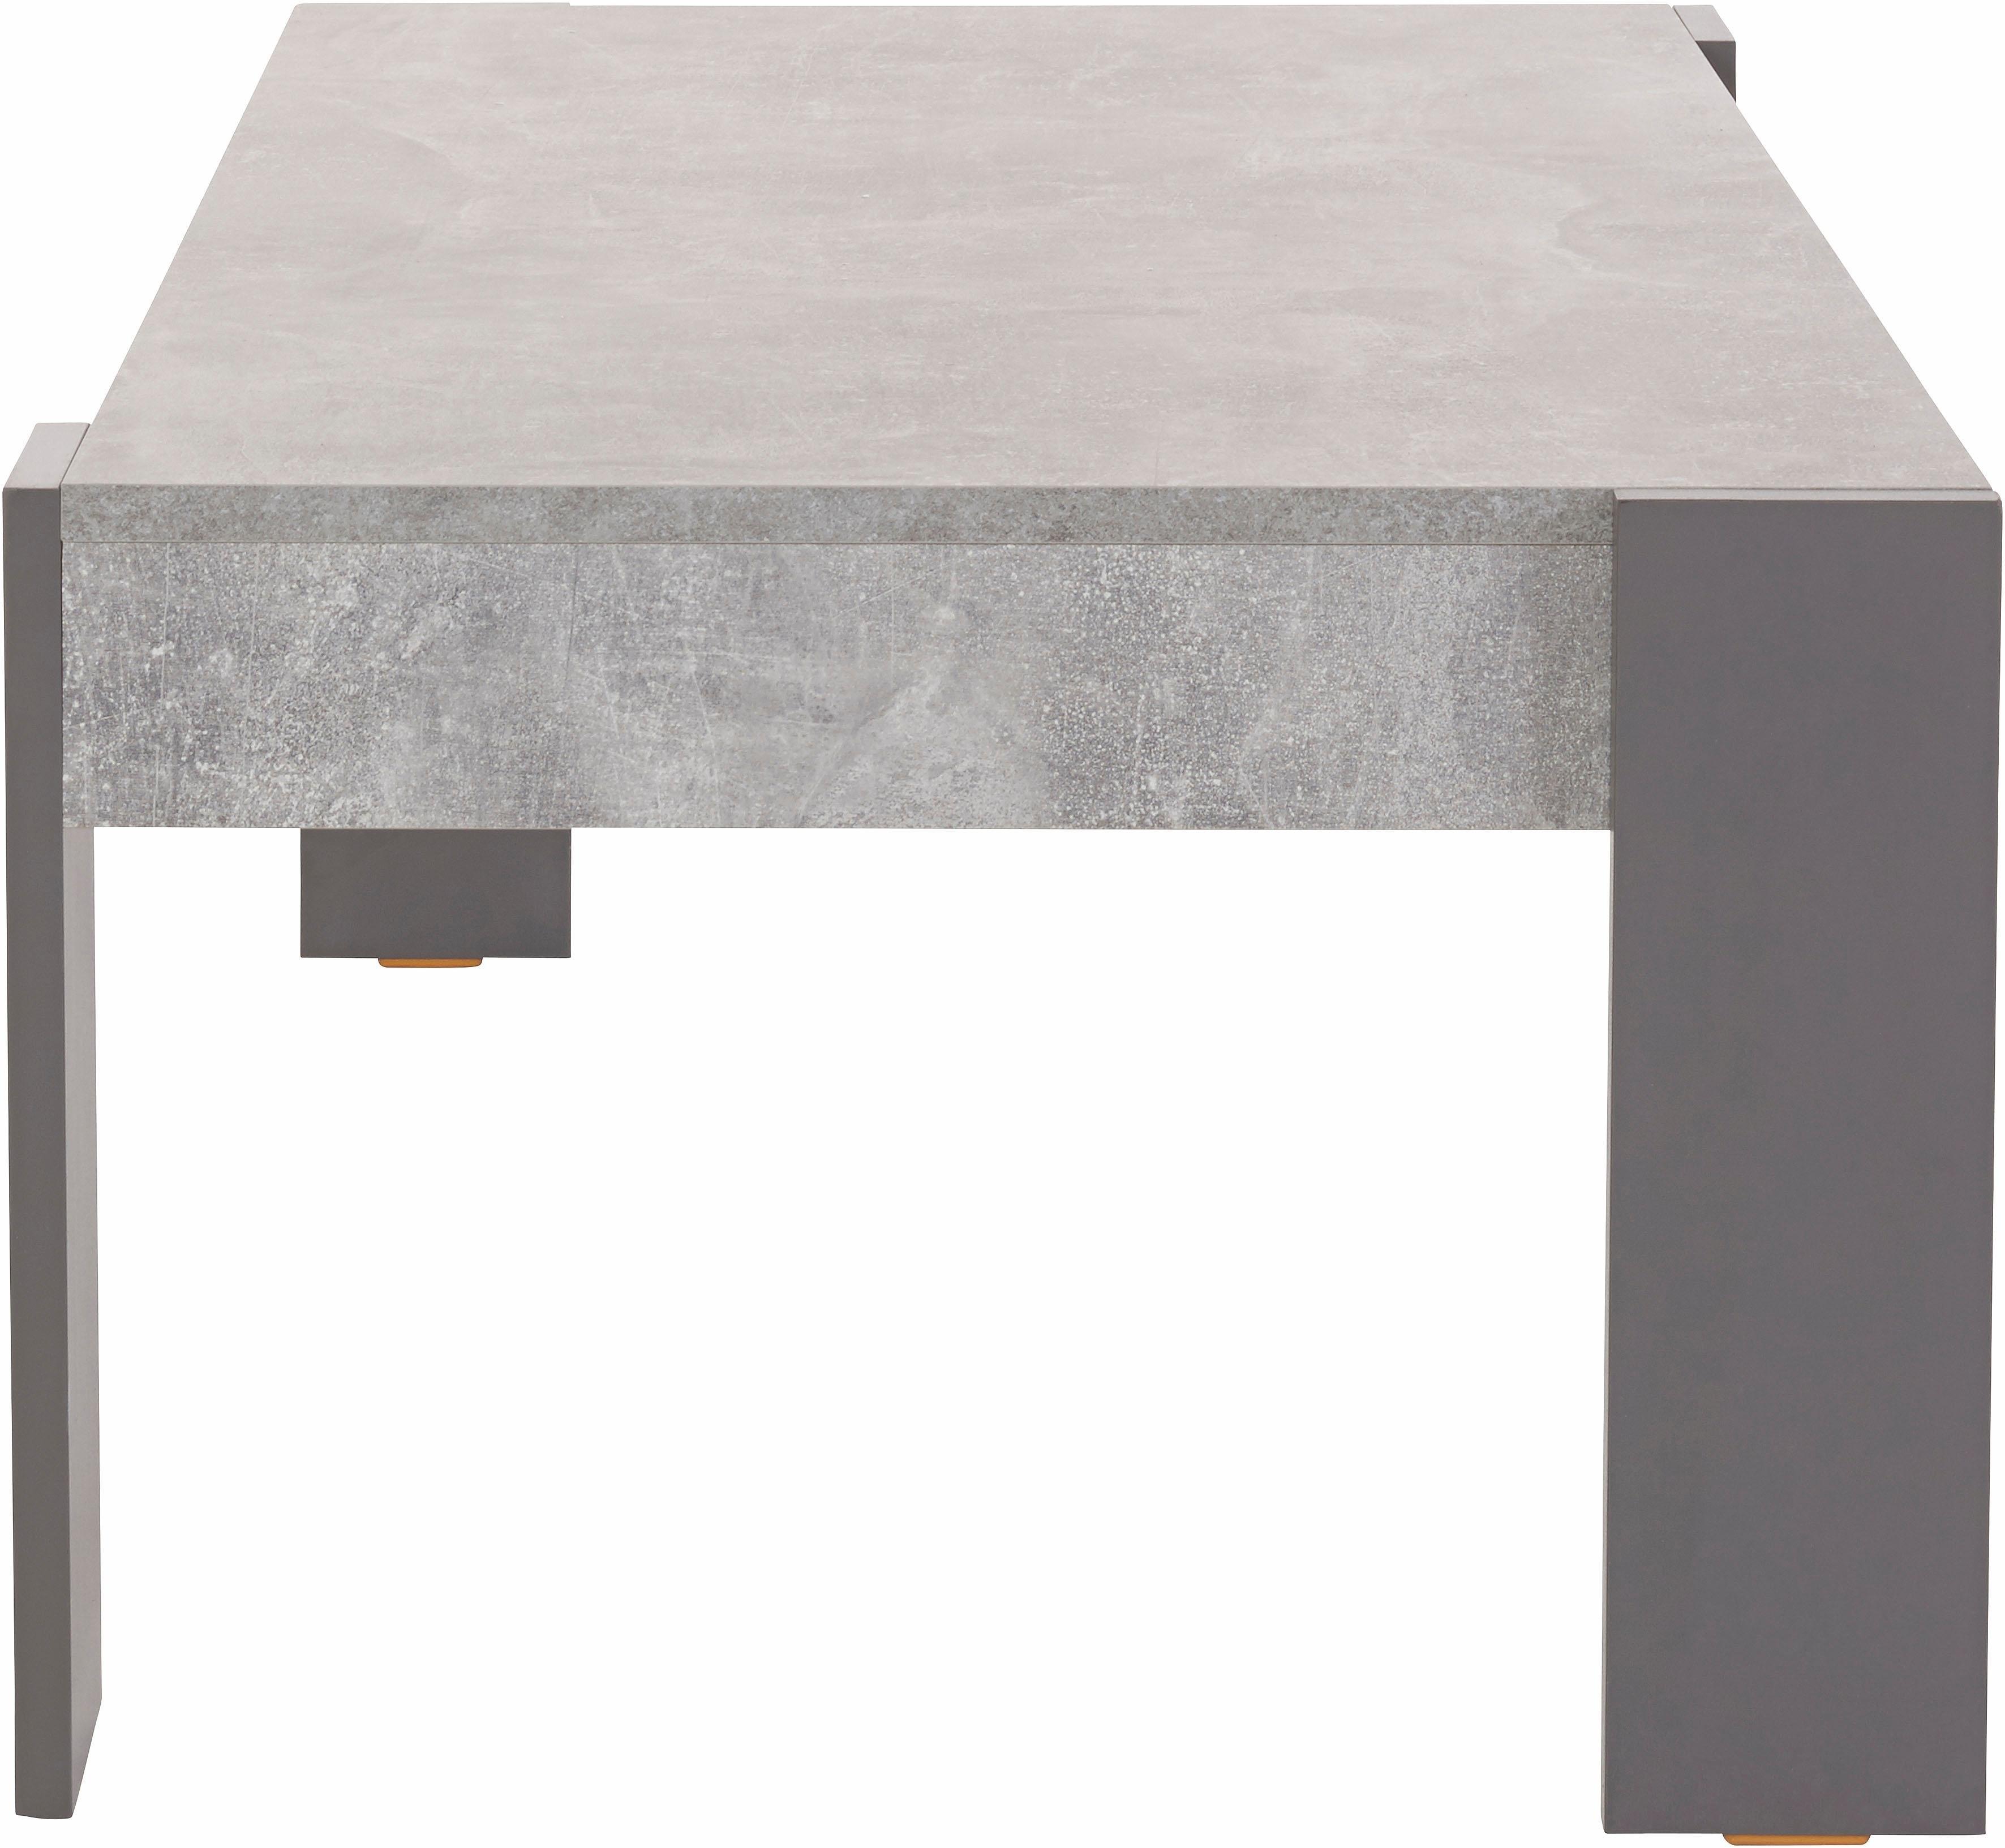 Betonlook Salon Tafel.Salontafel In Moderne Beton Look